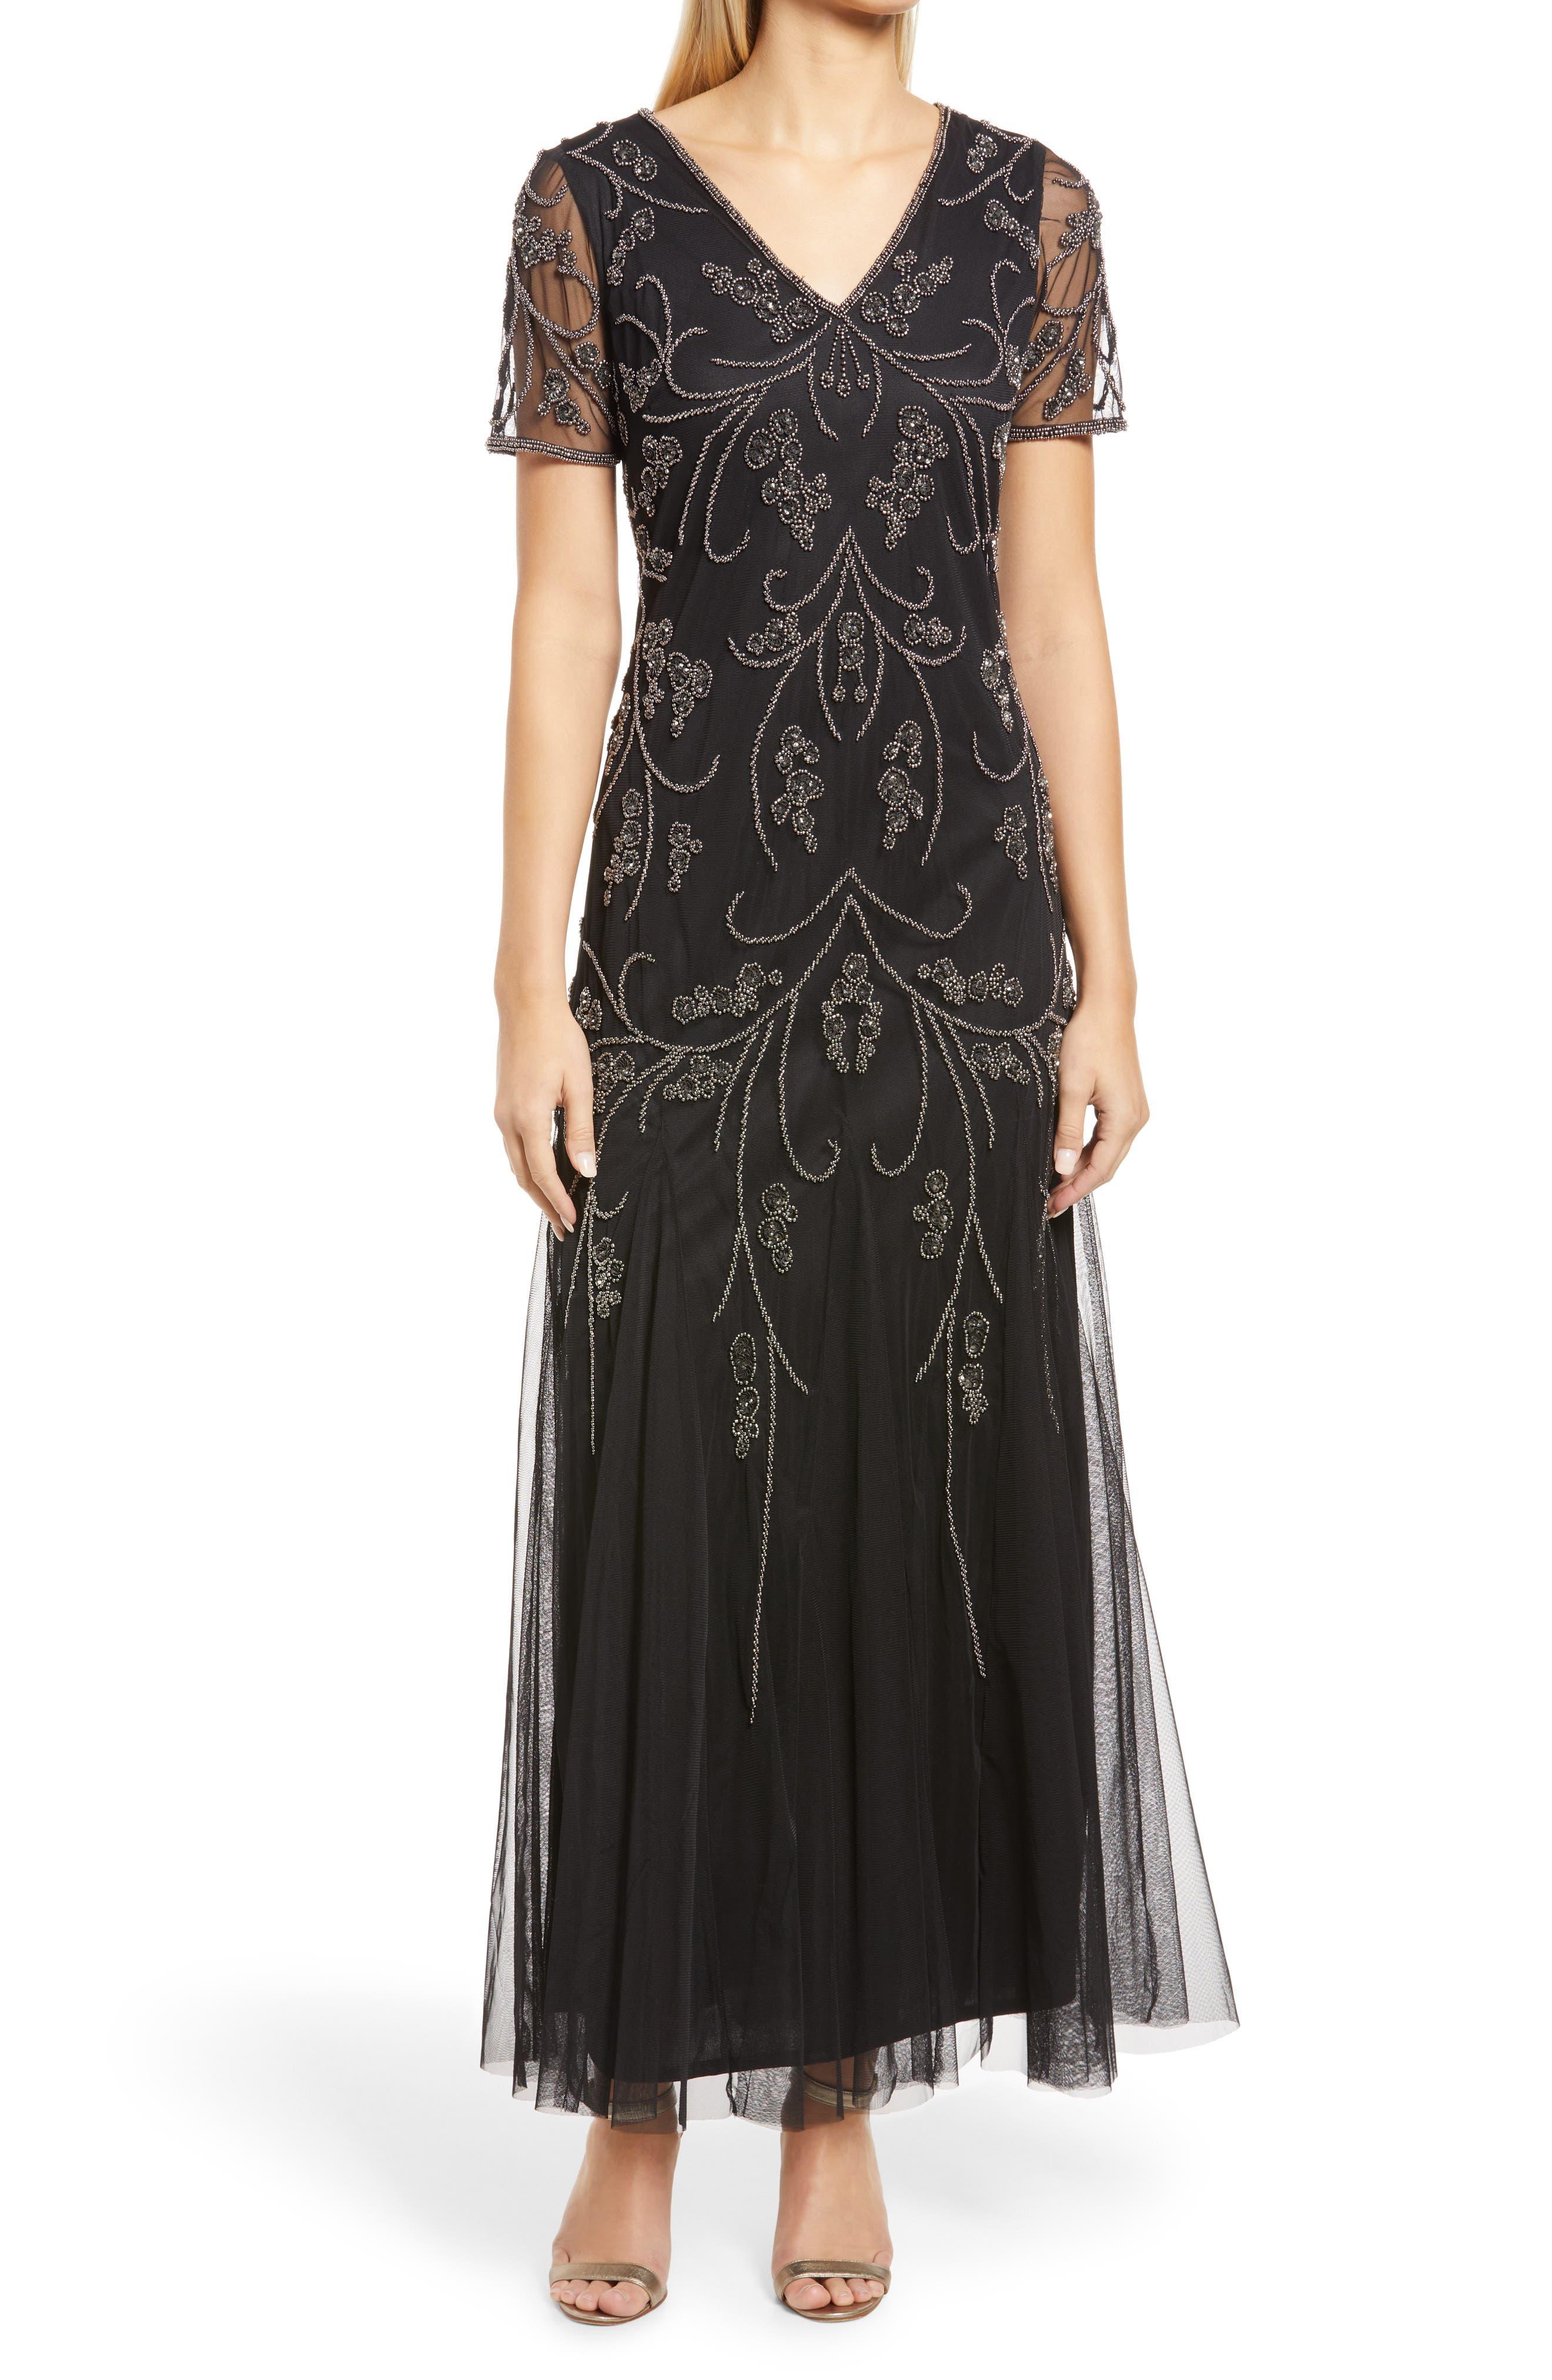 Vintage 1920s Dresses – Where to Buy Womens Pisarro Nights Beaded V-Neck Gown Size 2 - Black $228.00 AT vintagedancer.com